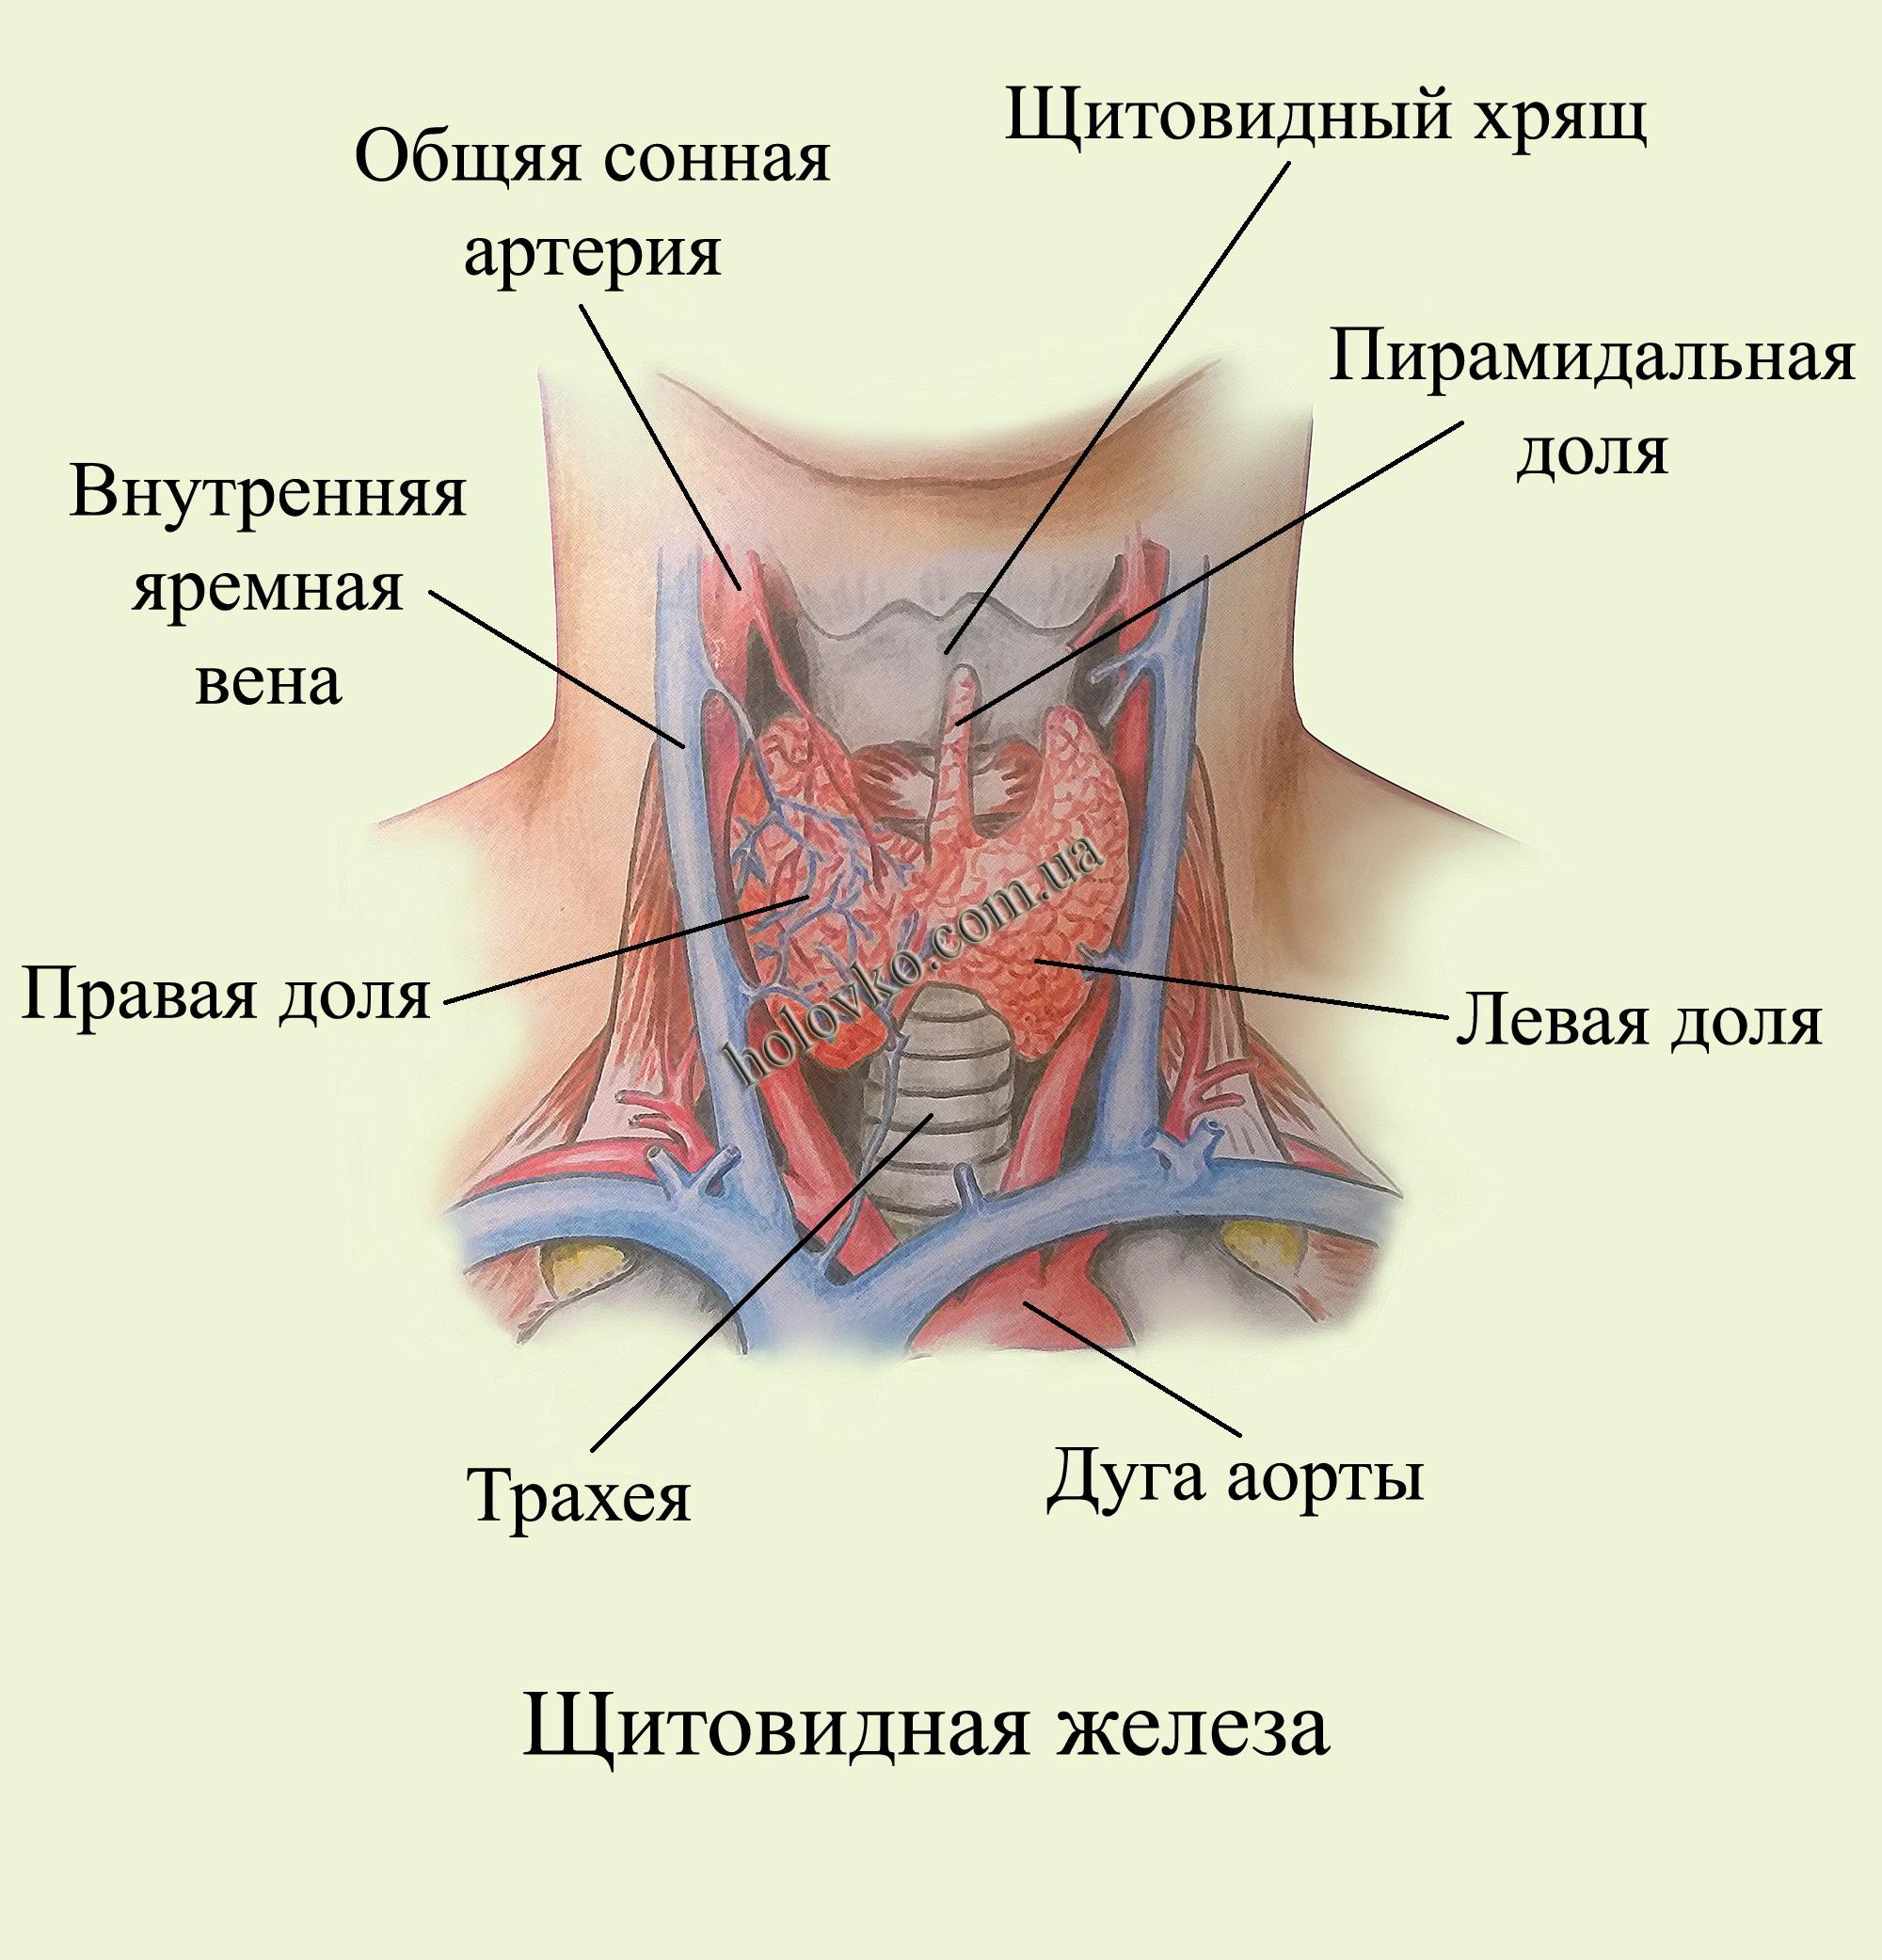 препараты при гипотиреозе щитовидной железы